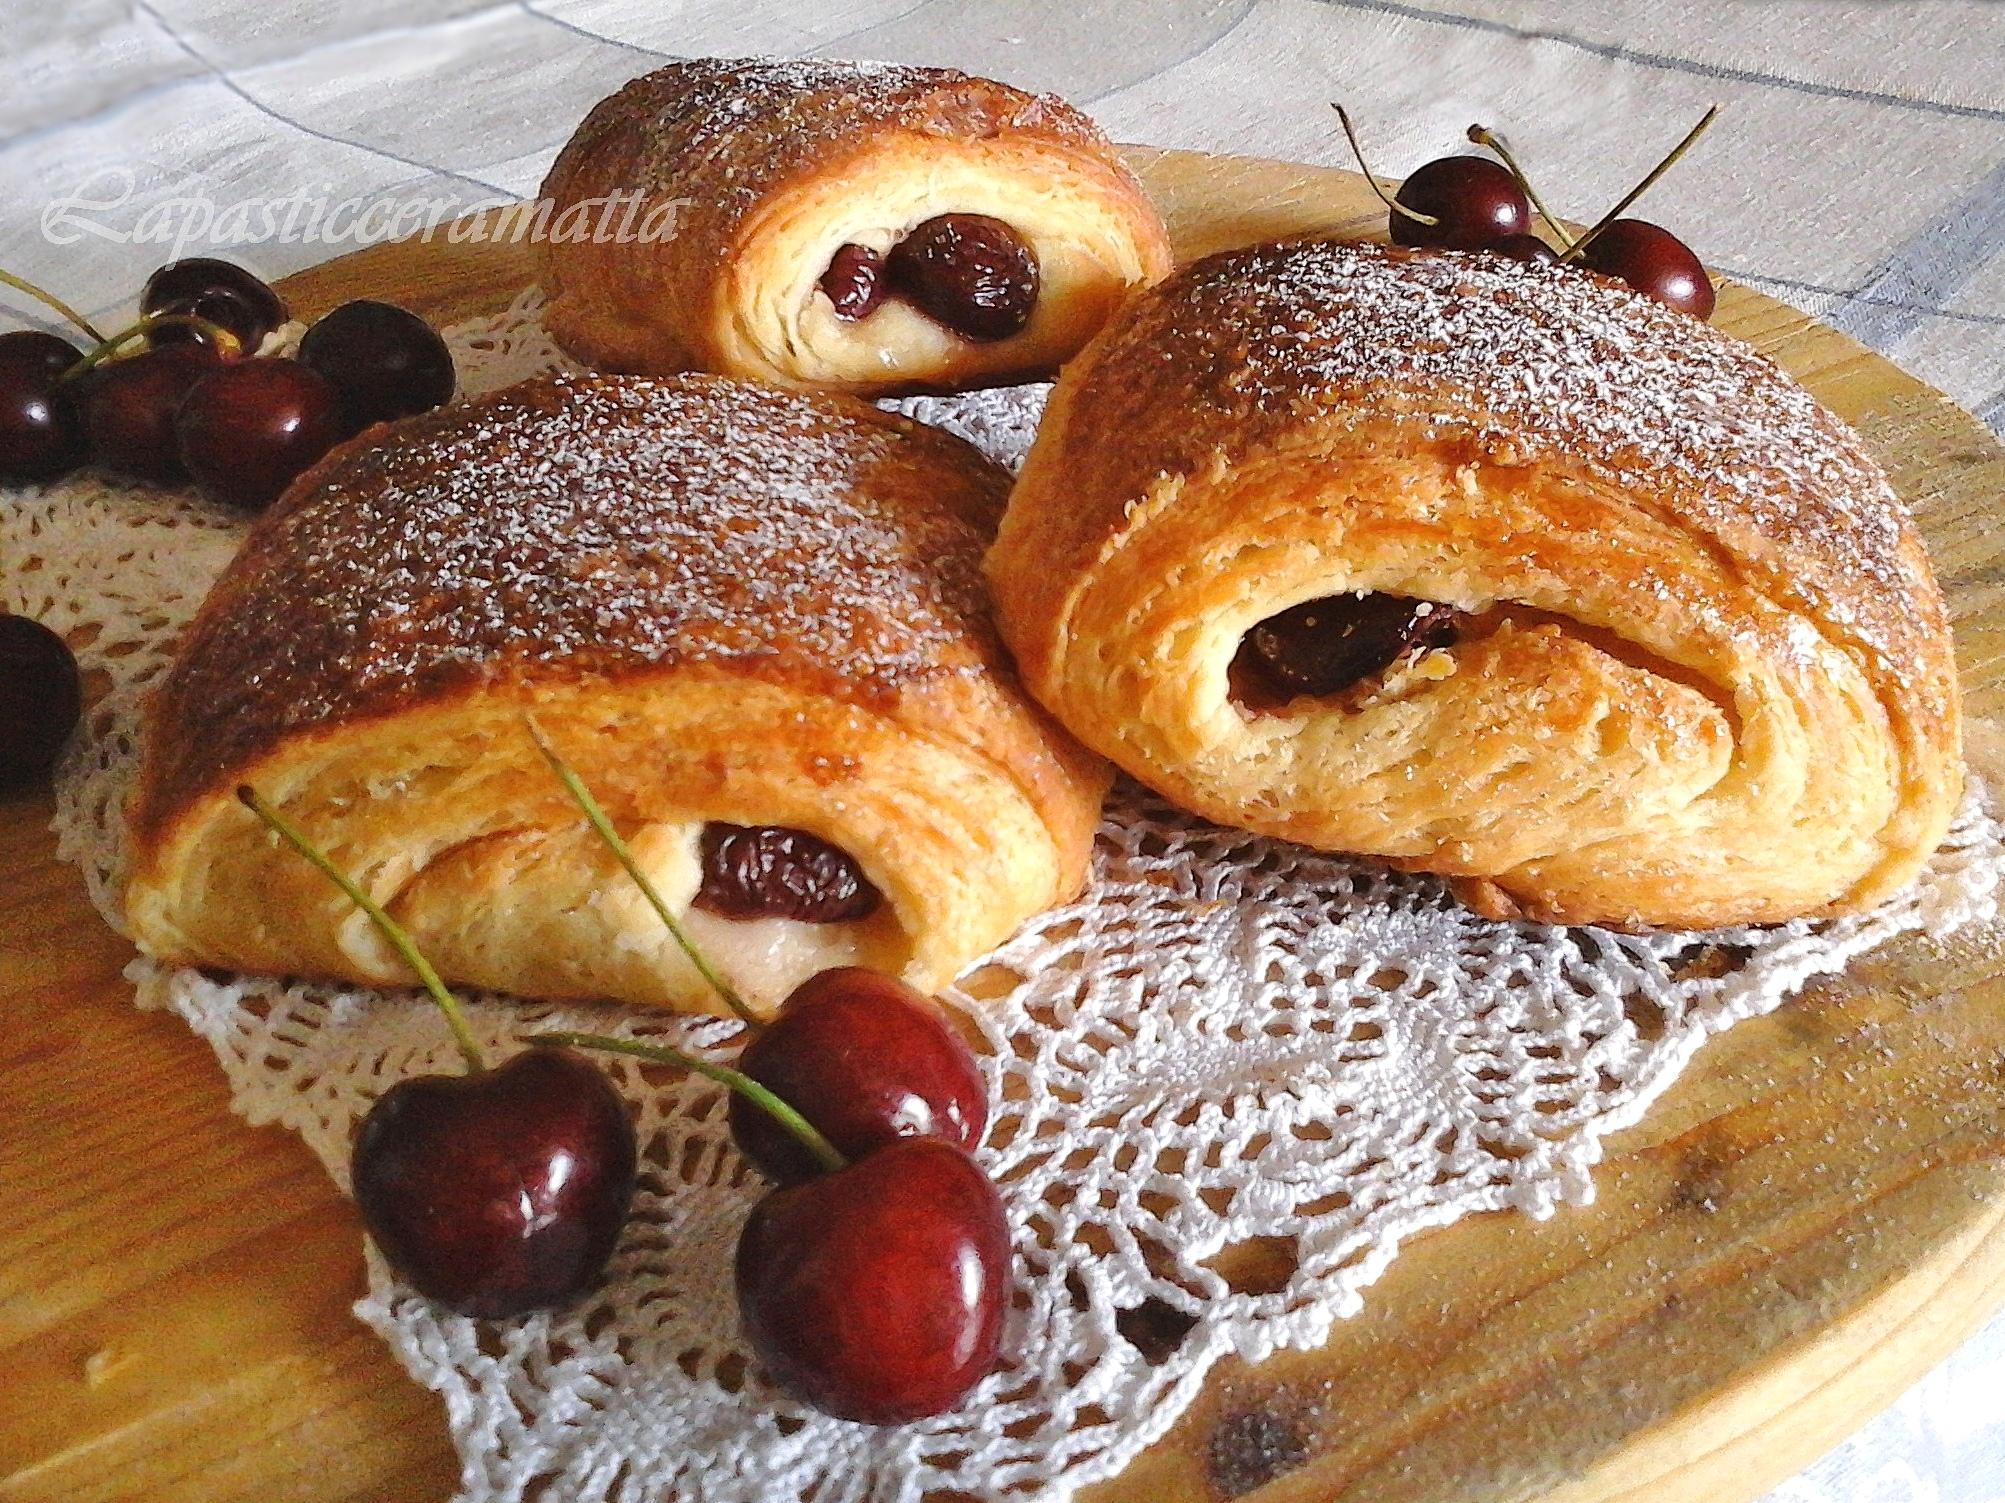 Saccottini alle ciliegie o pain aux cerises con pasta madre